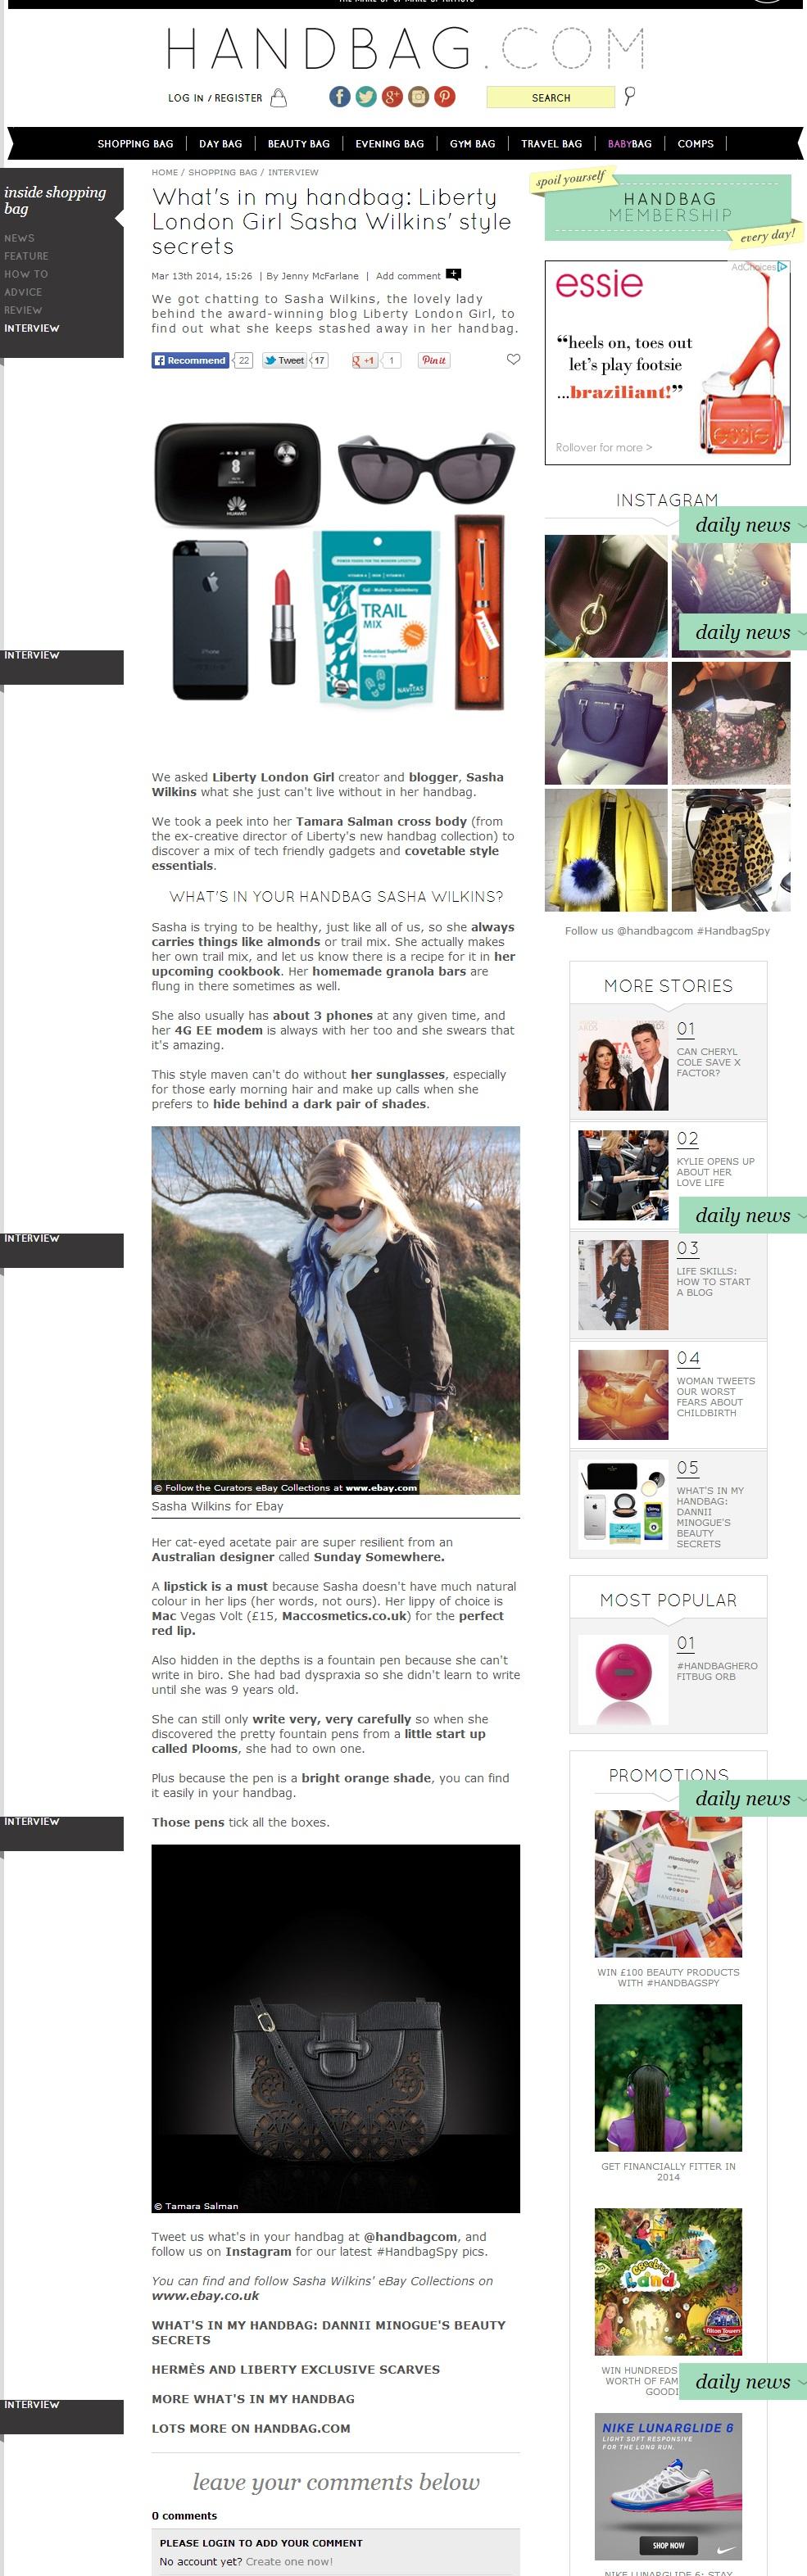 screencapture-www-handbag-com-shopping-bag-interviews-a556943-whats-in-my-handbag-liberty-london-girl-sasha-wilkins-style-secrets-html